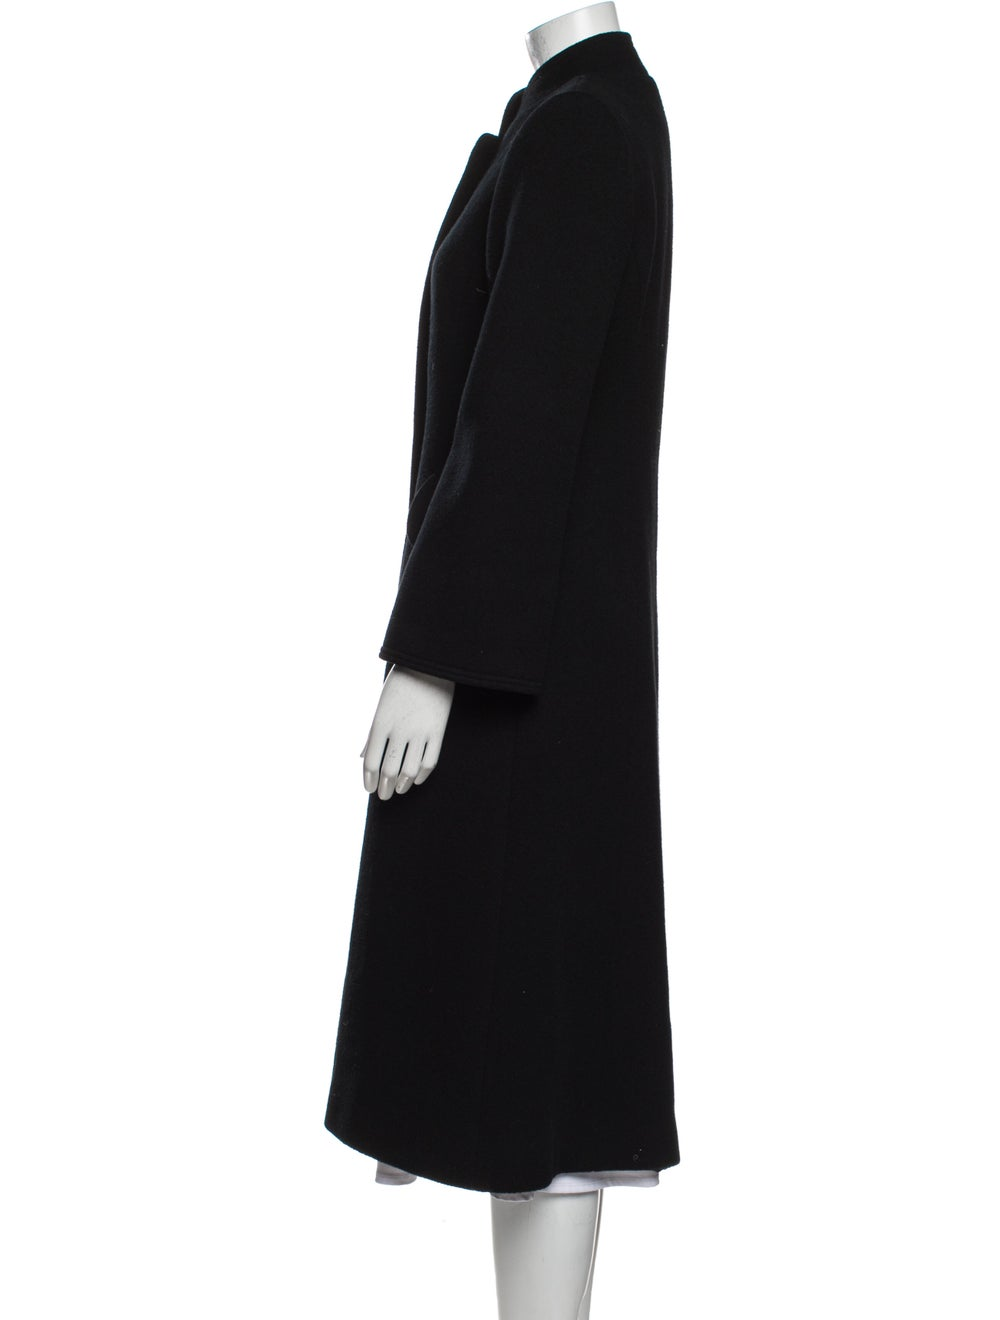 Pauline Trigere Coat Black - image 2